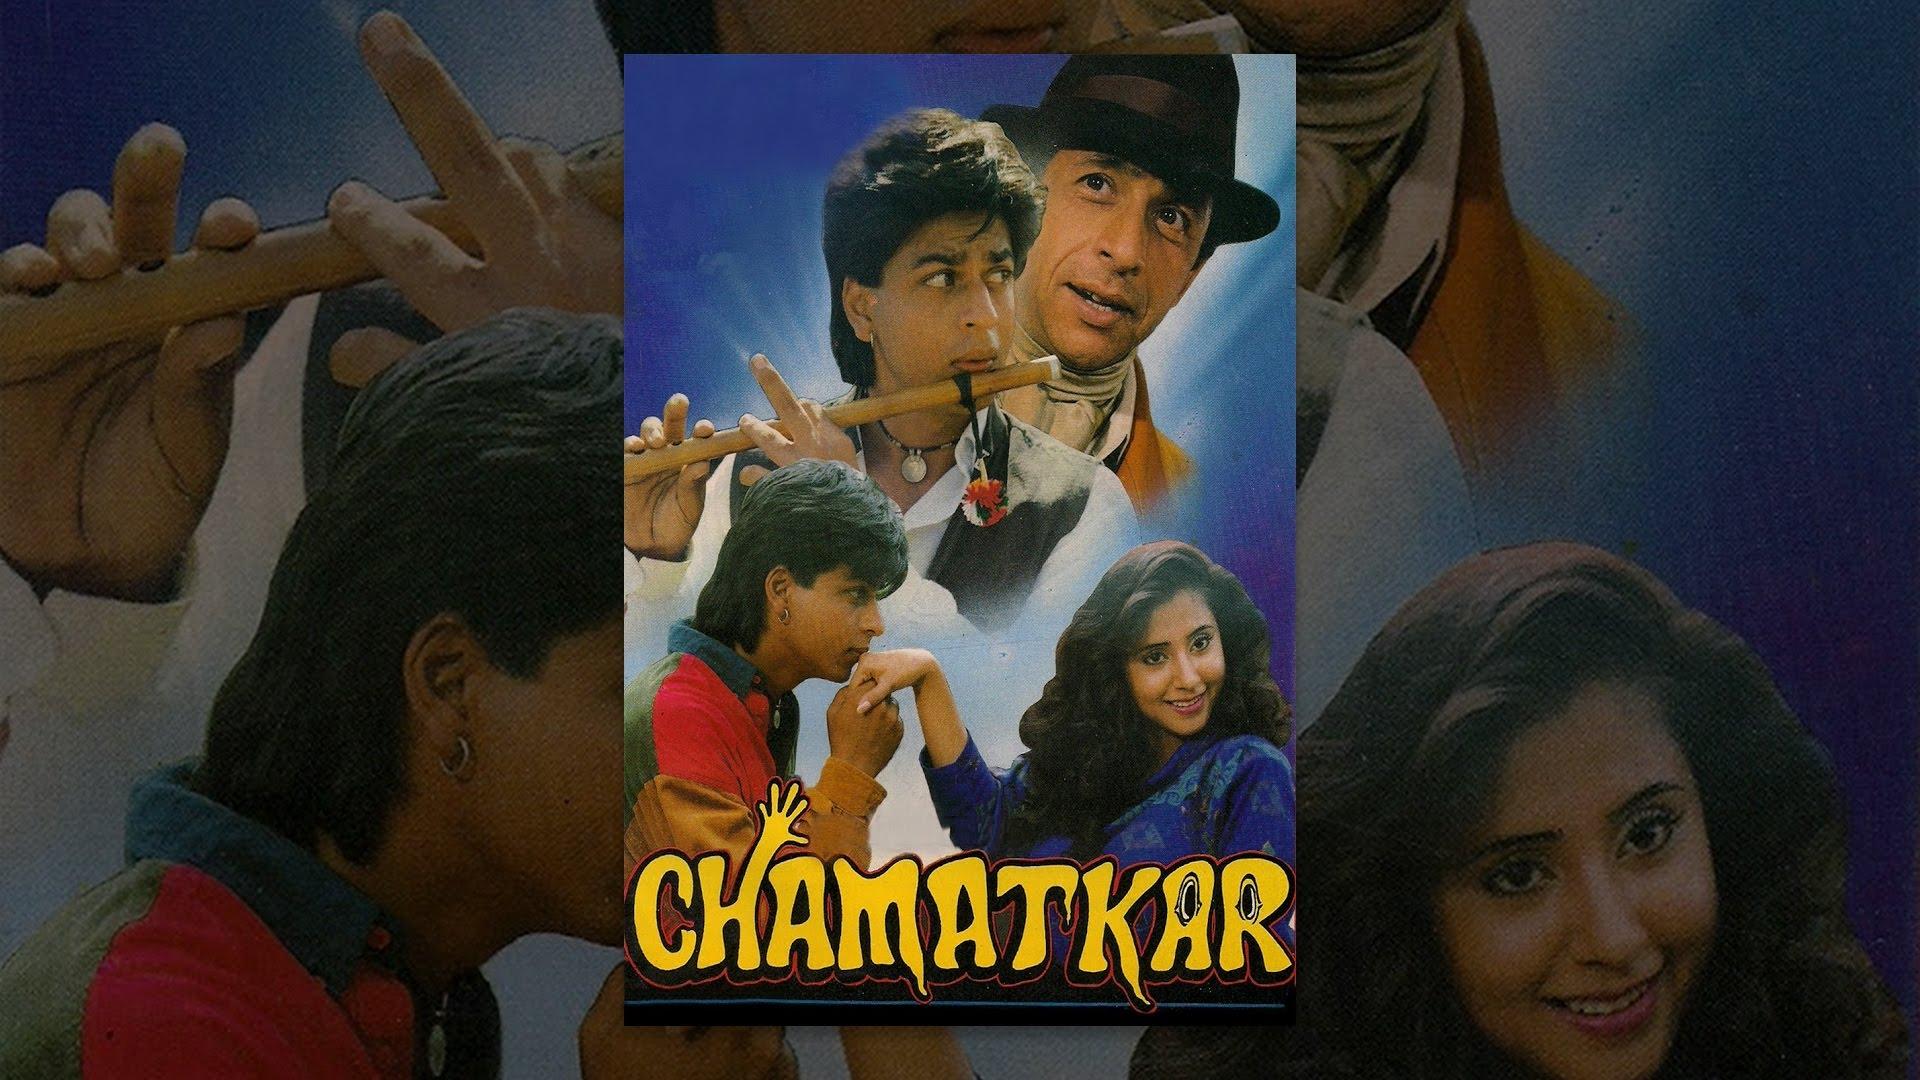 Download Chamatkar